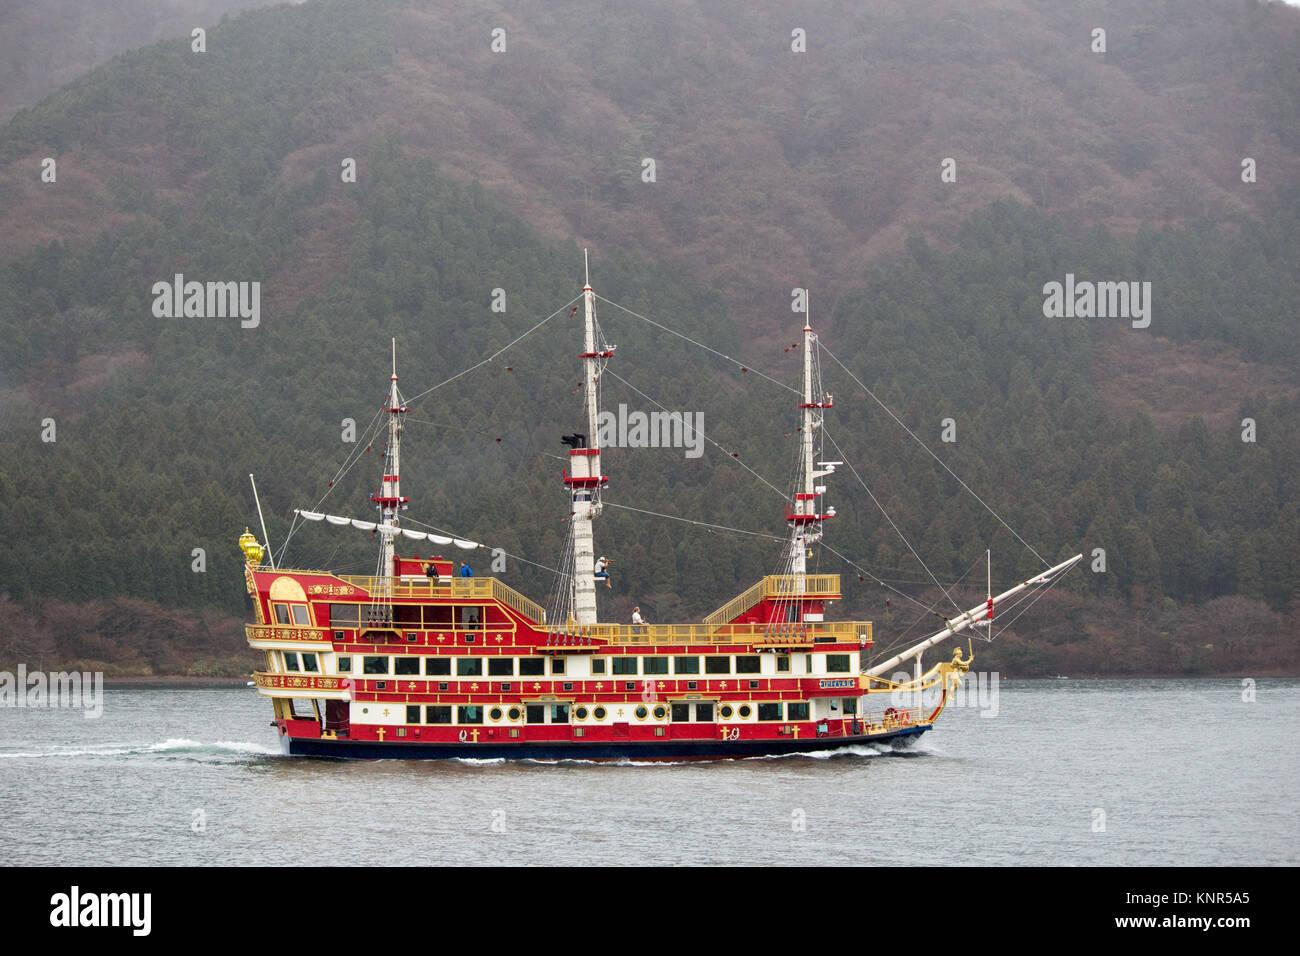 Pirate tourist ship on a misty Hakone Lake in Japan - Stock Image